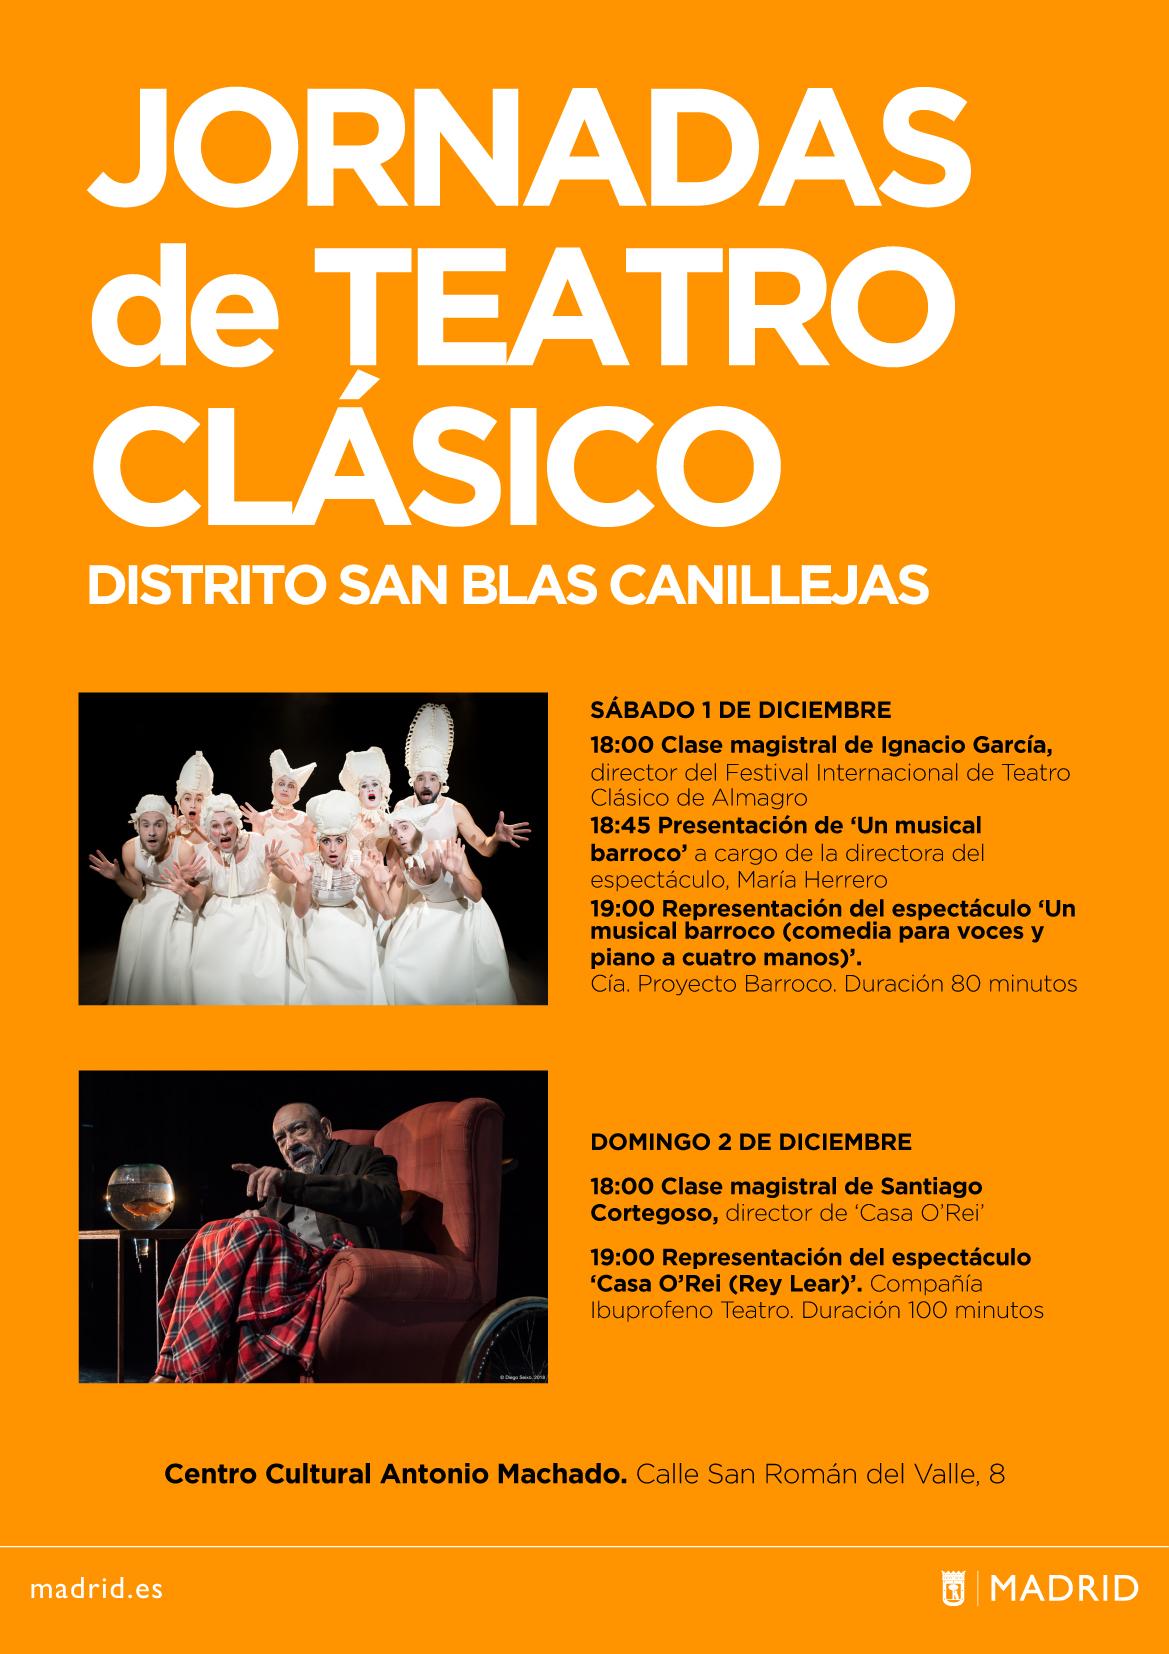 Jornadas de Teatro Clásico San Blas